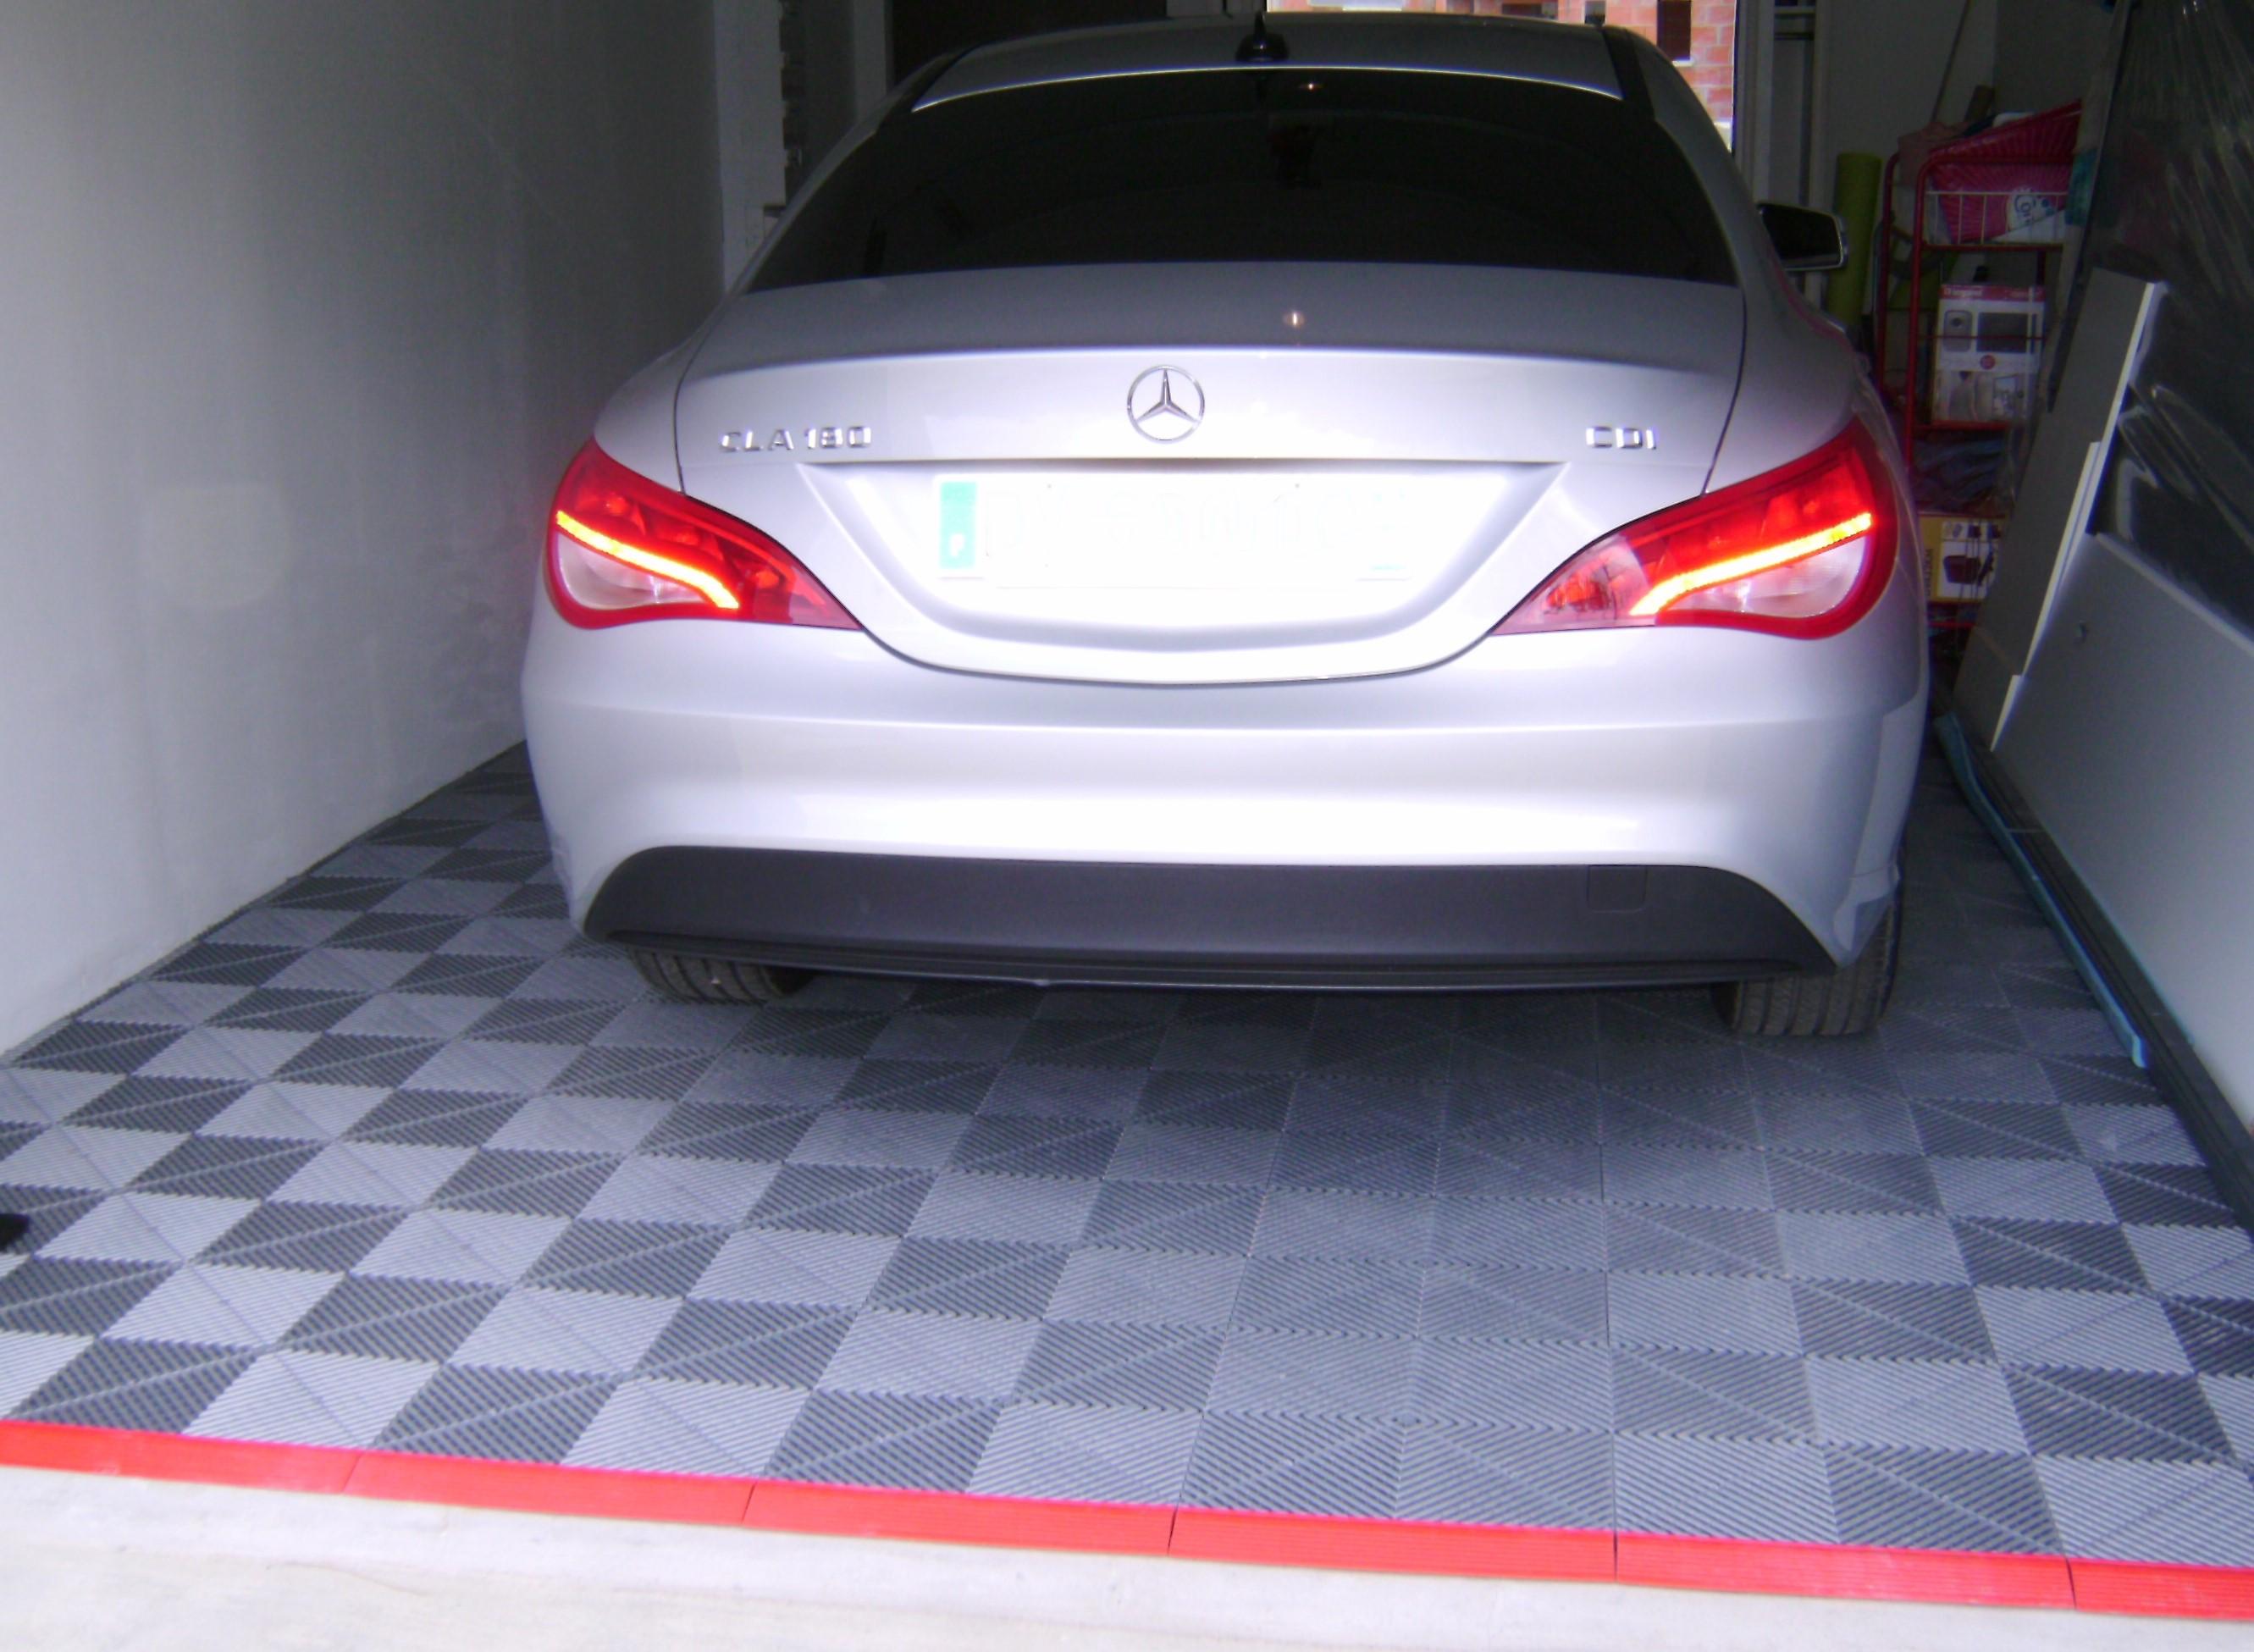 Polydal sol damier pour garage